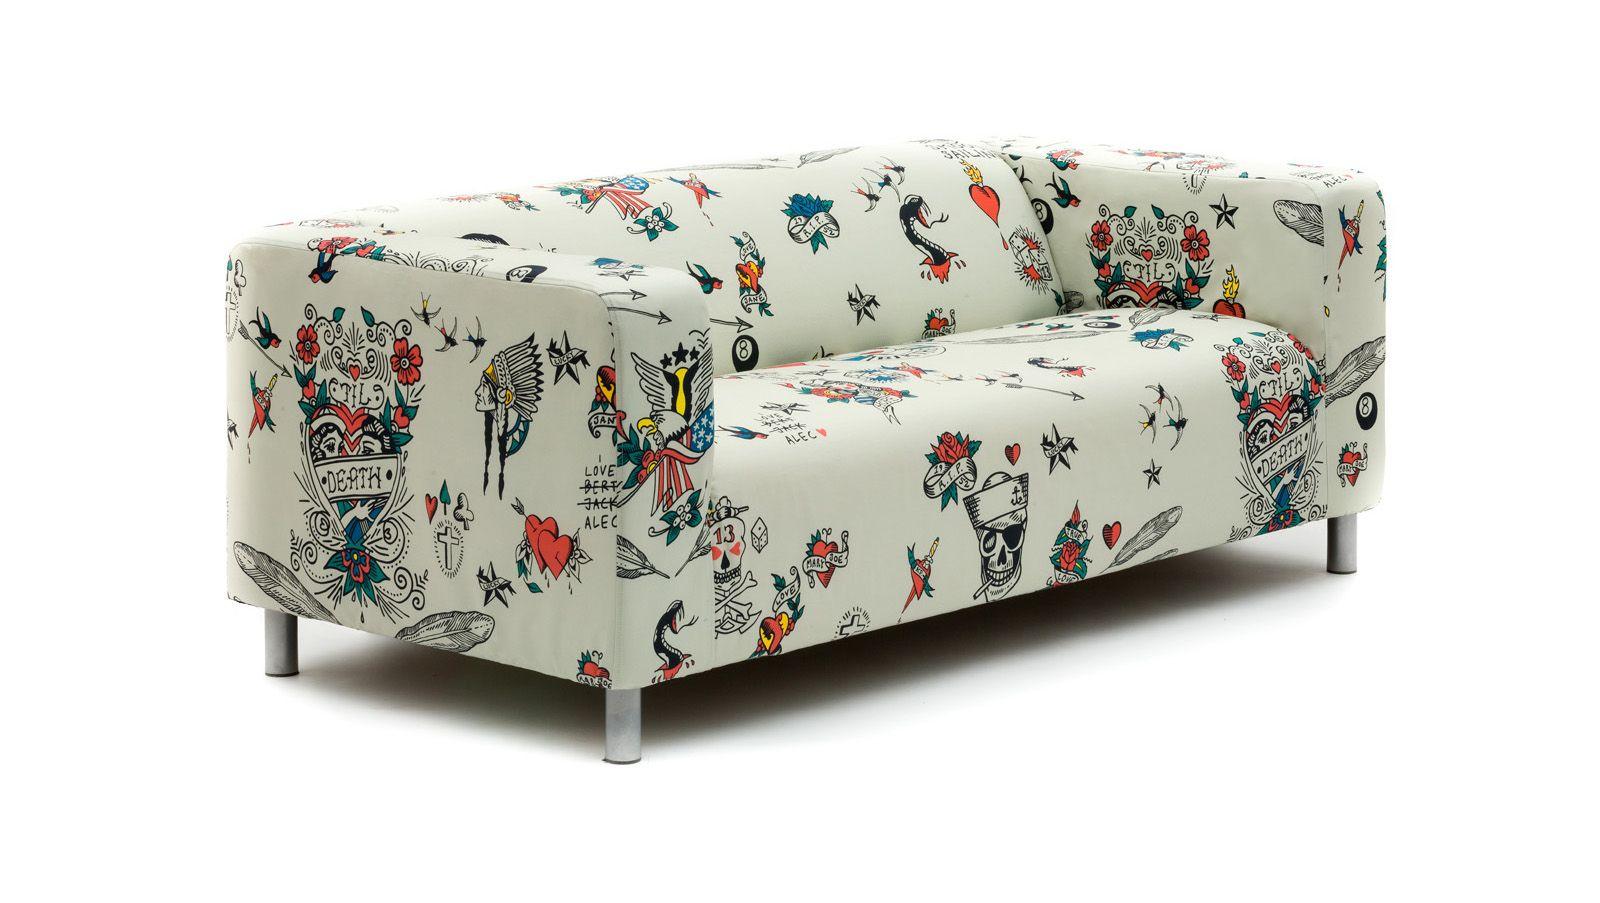 Outstanding Tattoo Ikea Klippan Cover Patio Furniture Covers Sofa Machost Co Dining Chair Design Ideas Machostcouk